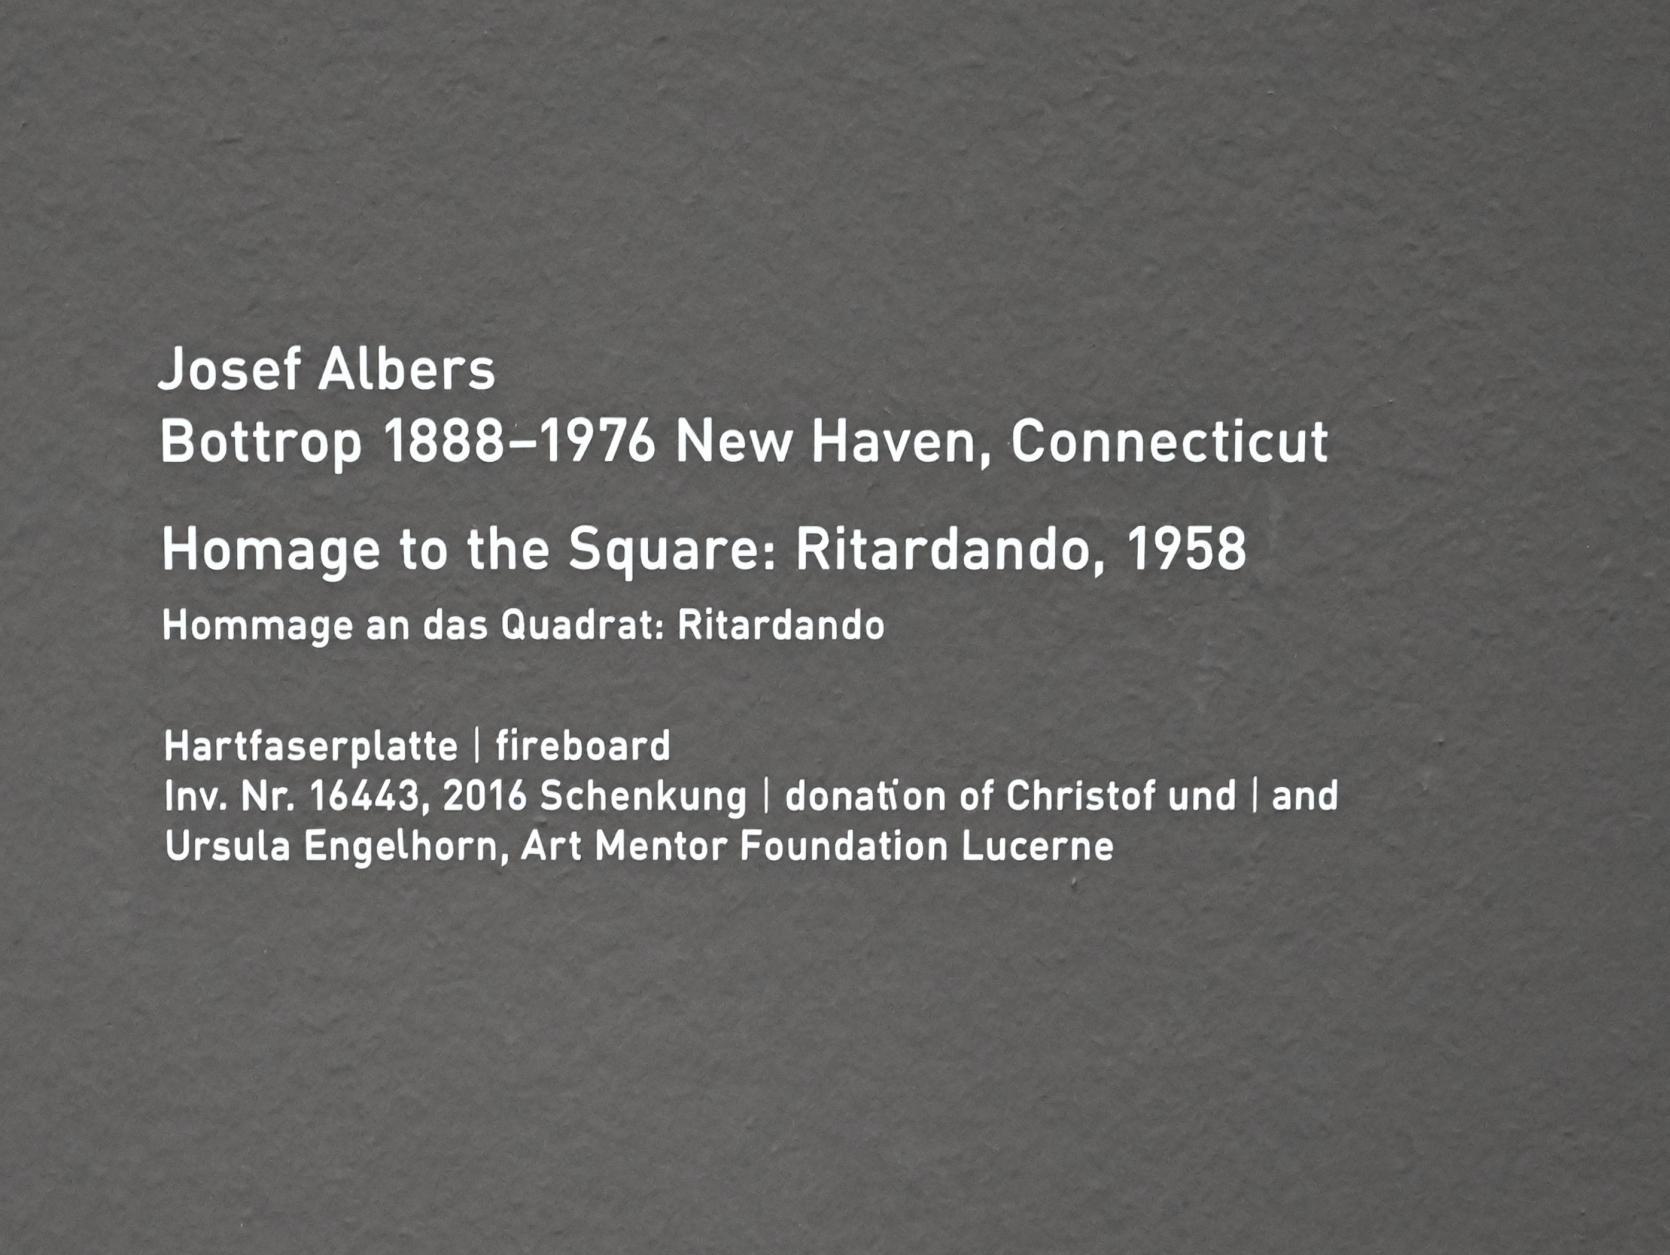 Josef Albers: Homage to the Square: Ritardando, 1958, Bild 2/2